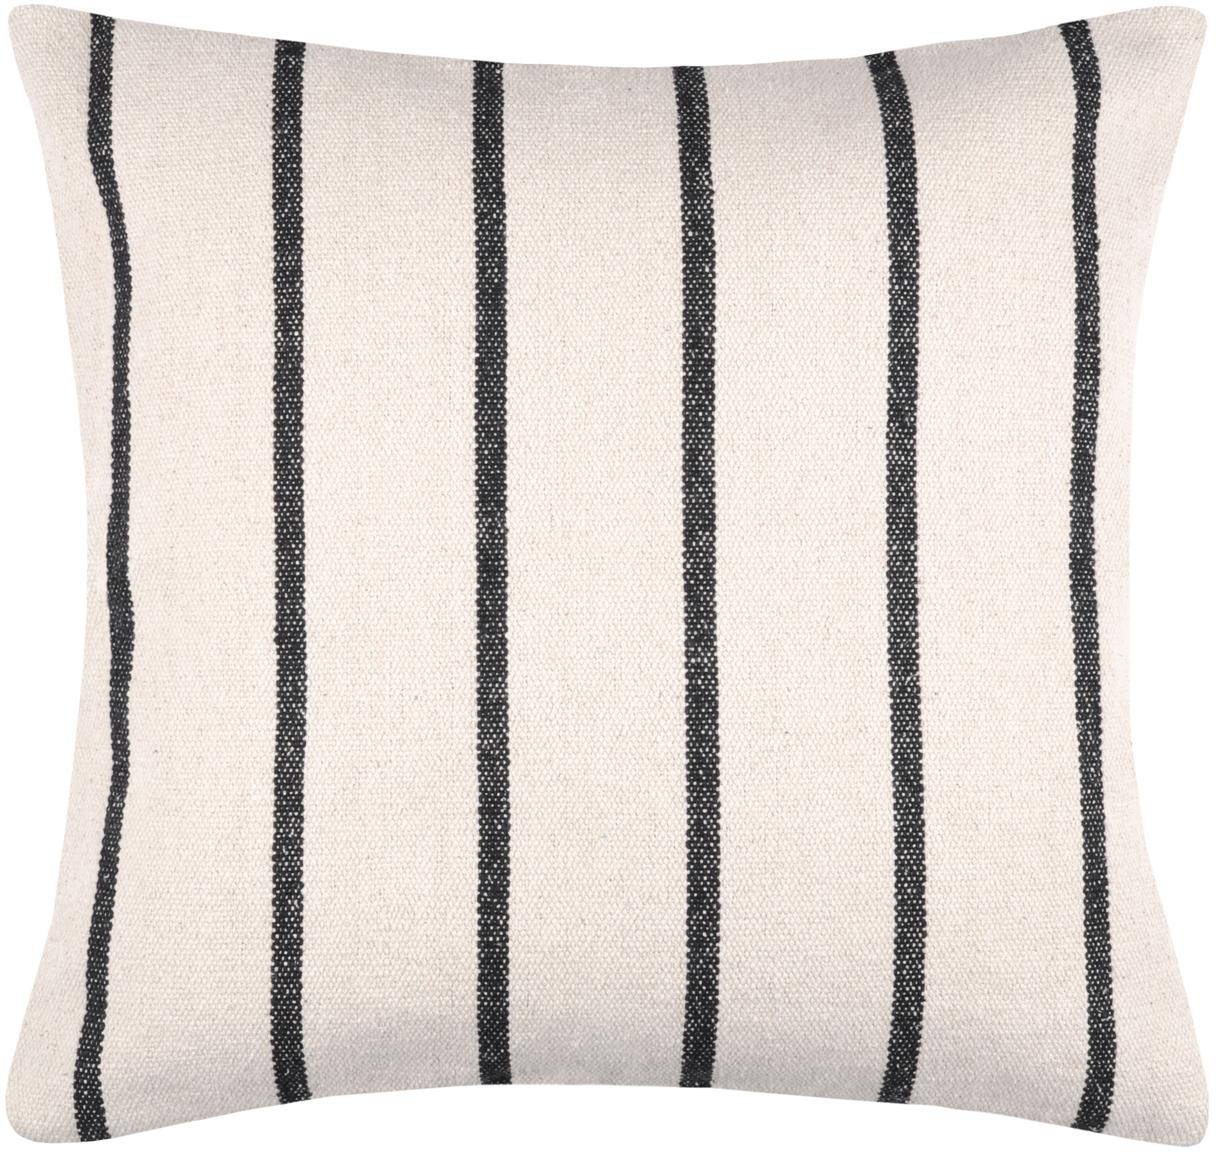 Cuscino con imbottitura St Trop, Rivestimento: 100% cotone, Nero, bianco, Larg. 50 x Lung. 50 cm